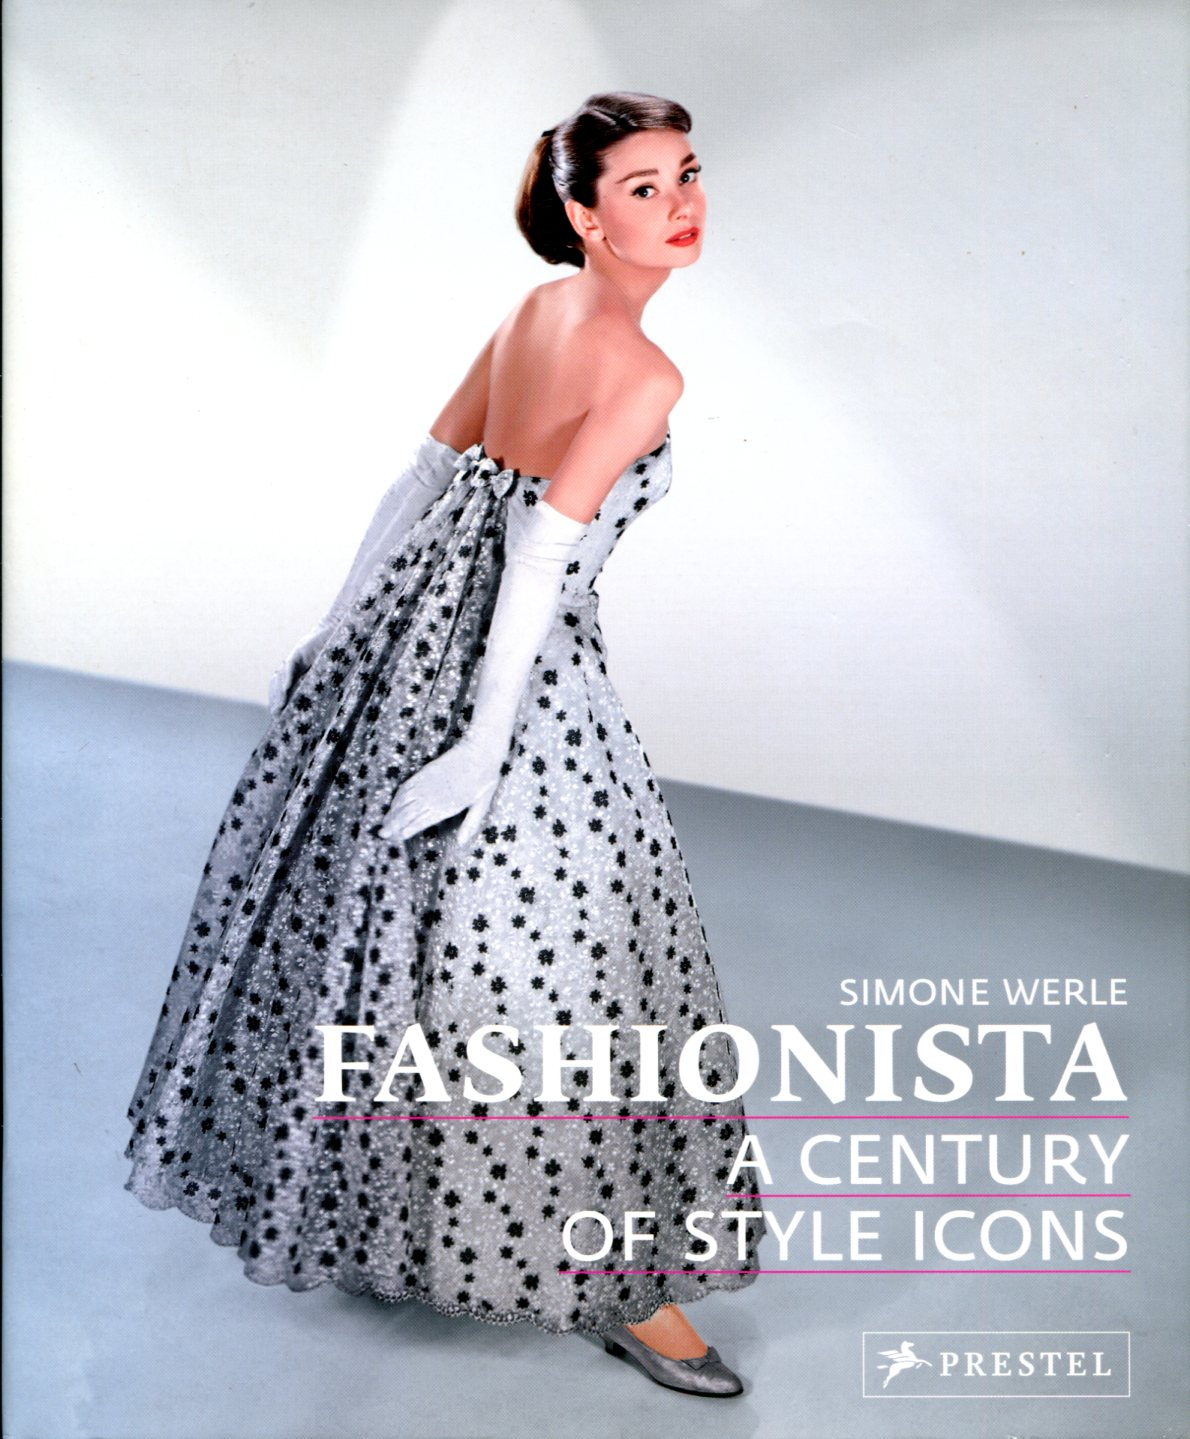 SIMONE WERLE - Fashionista: A Century of Style Icons